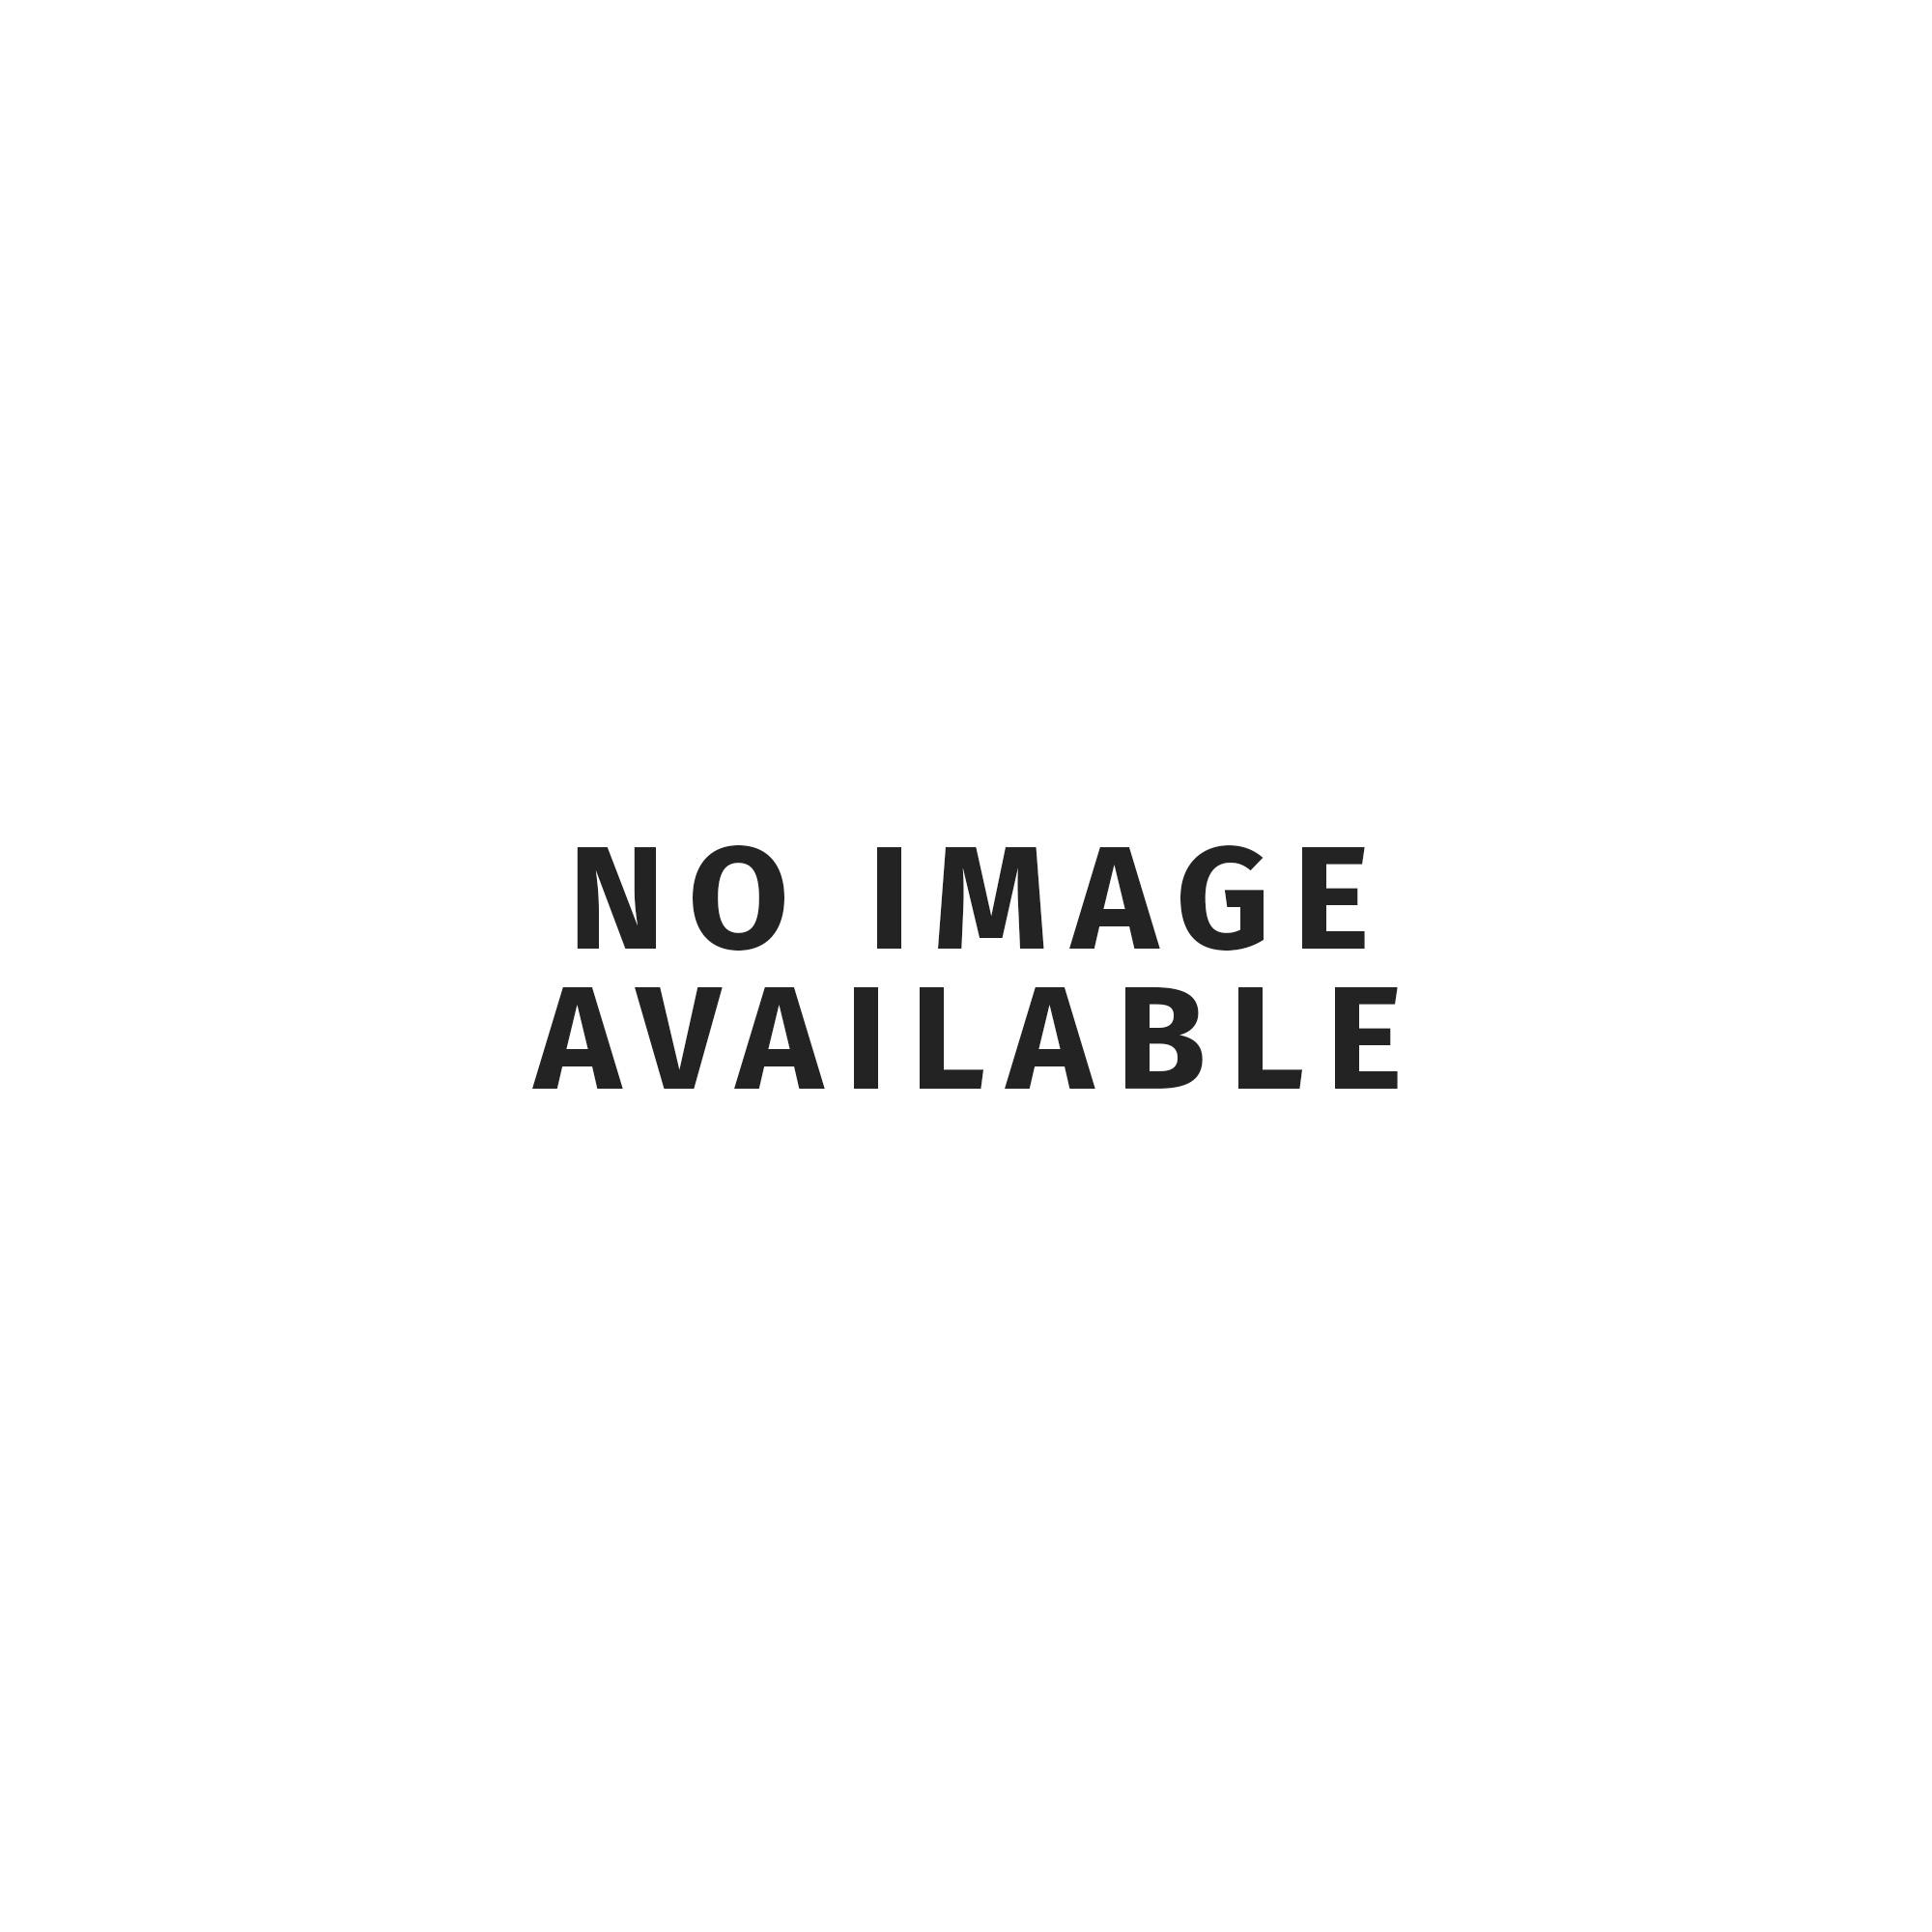 2ba69f6e4 Trek Women s Circuit Long-Sleeve Jersey